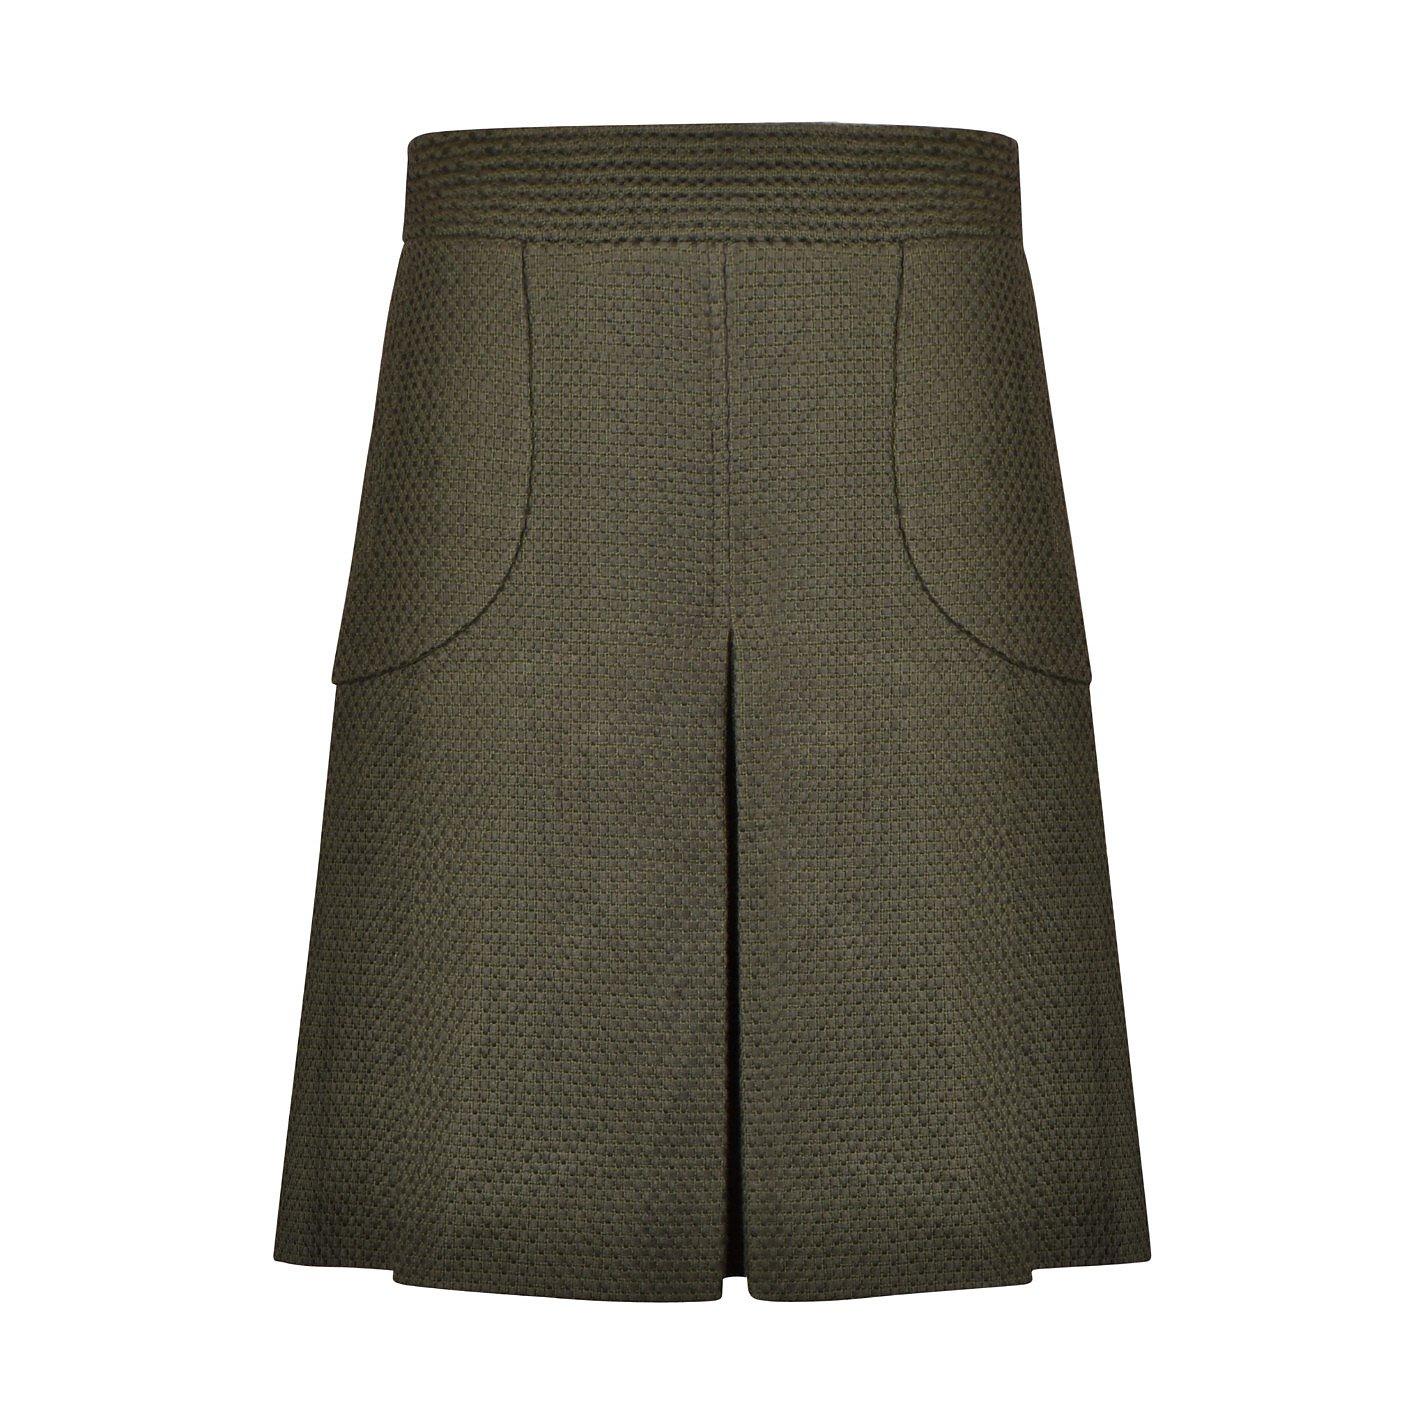 CHANEL Textured Cotton Skirt